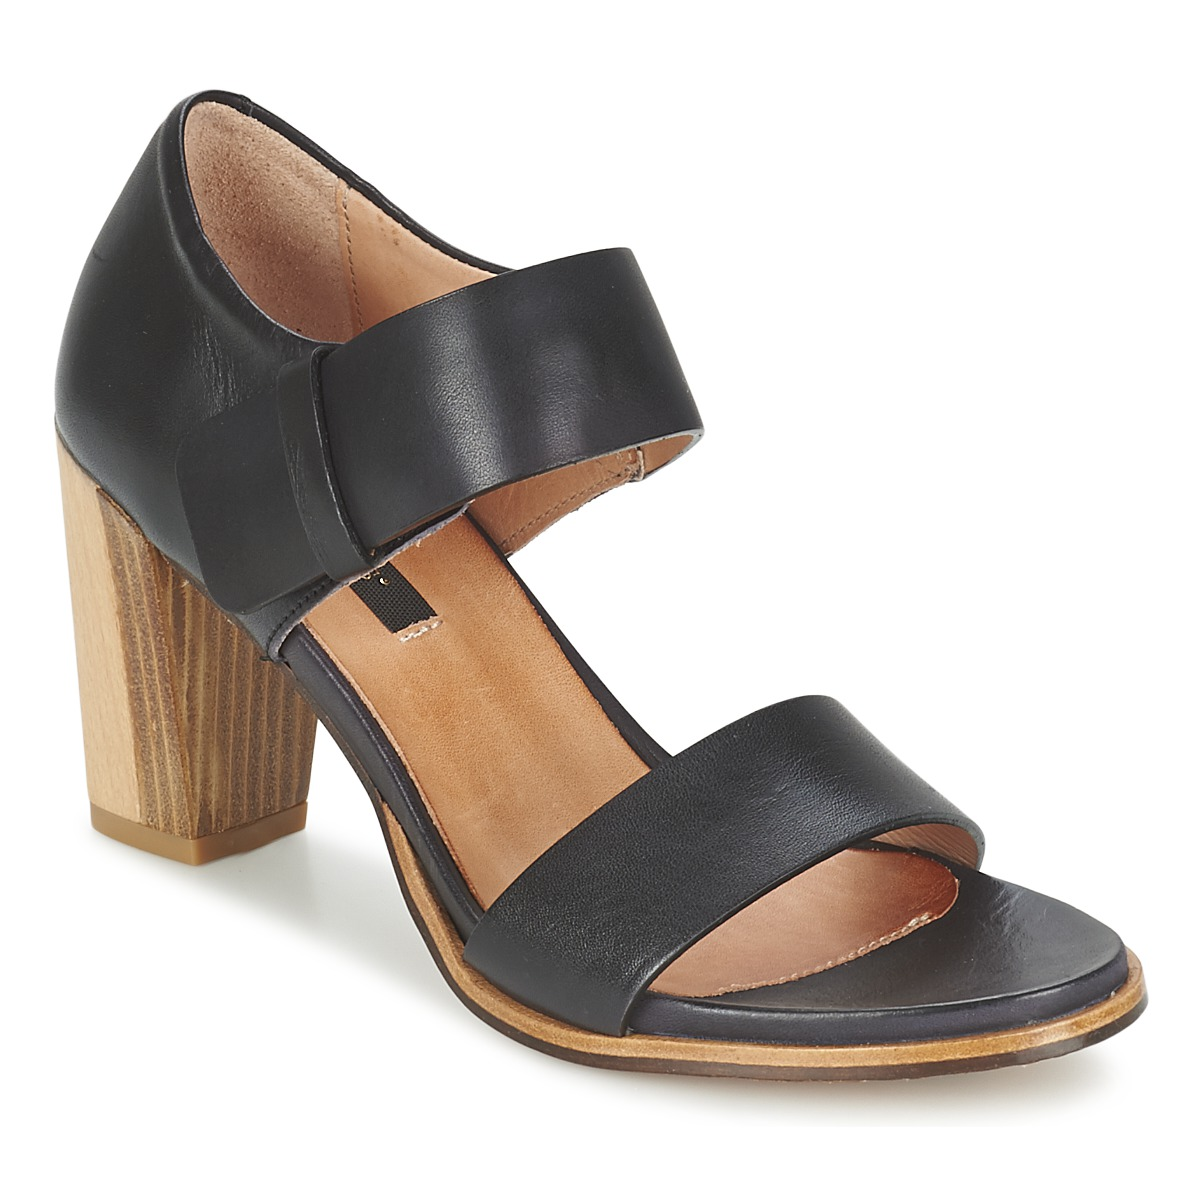 Neosens GLORIA 198 Schwarz - Kostenloser Versand bei Spartoode ! - Schuhe Sandalen / Sandaletten Damen 93,00 €